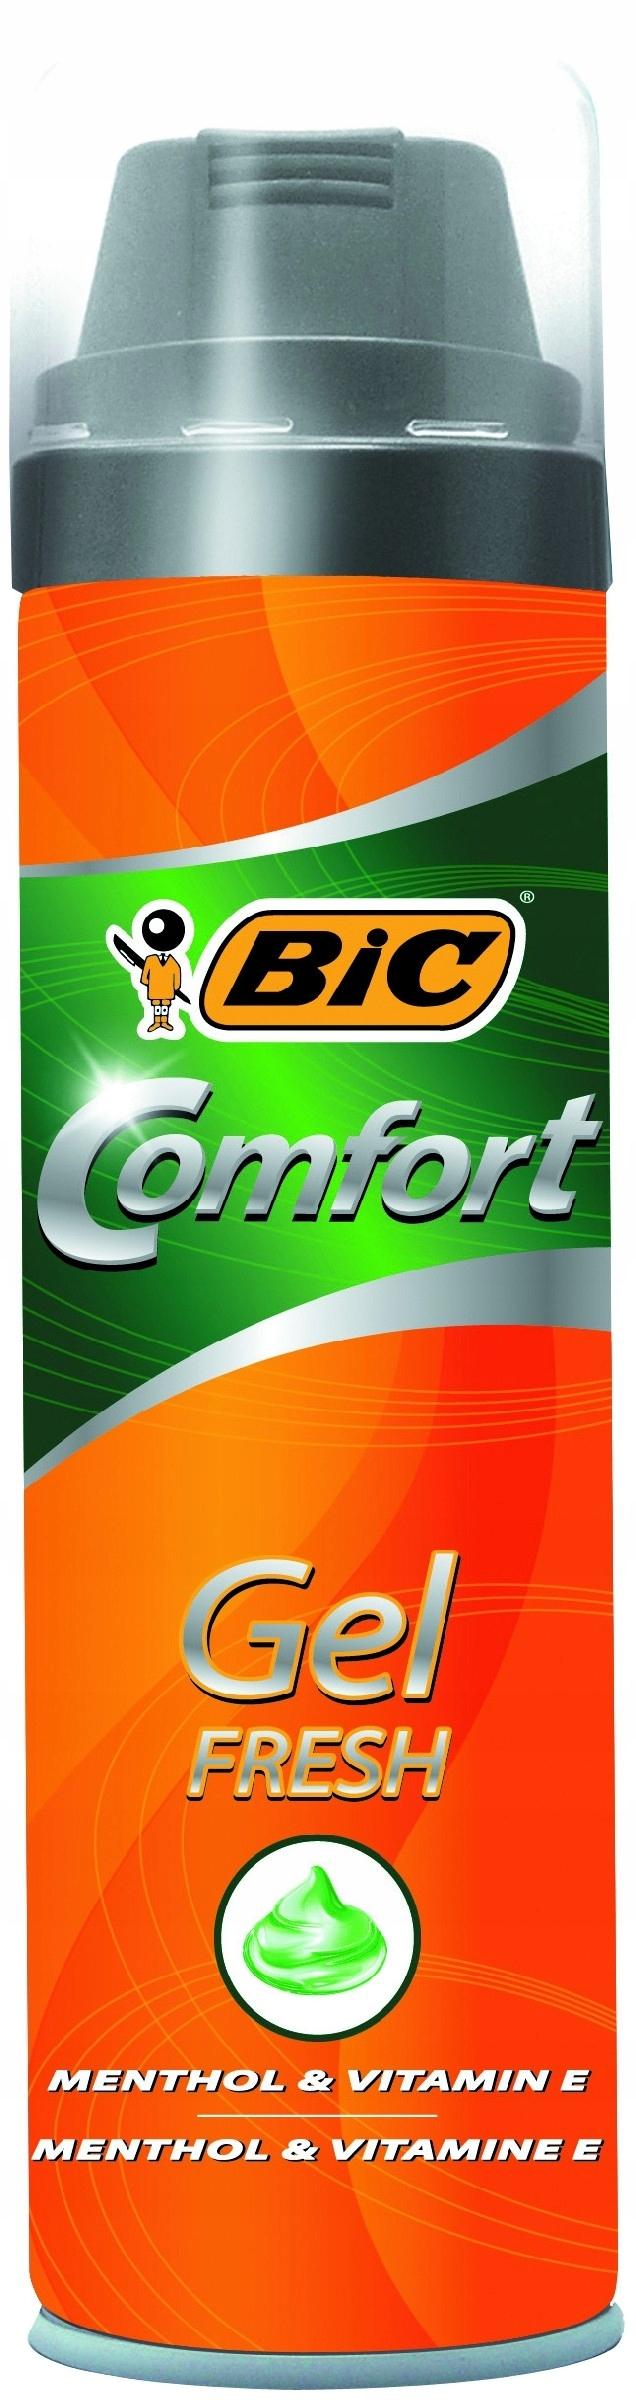 Bic Żel do golenia Fresh BIC COMFORT 200ml